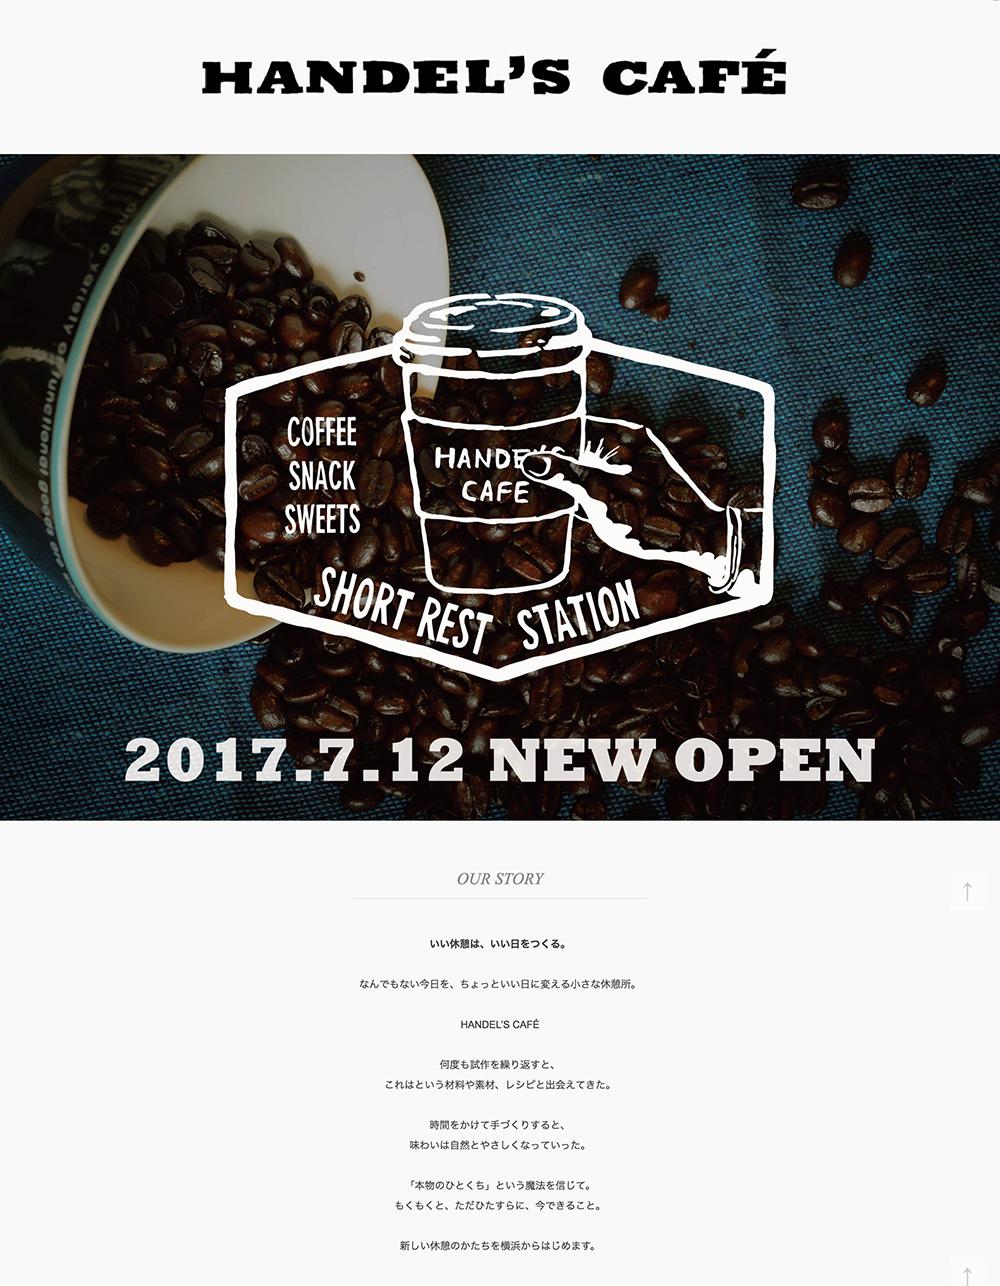 Handels cafe yokohama open info 02